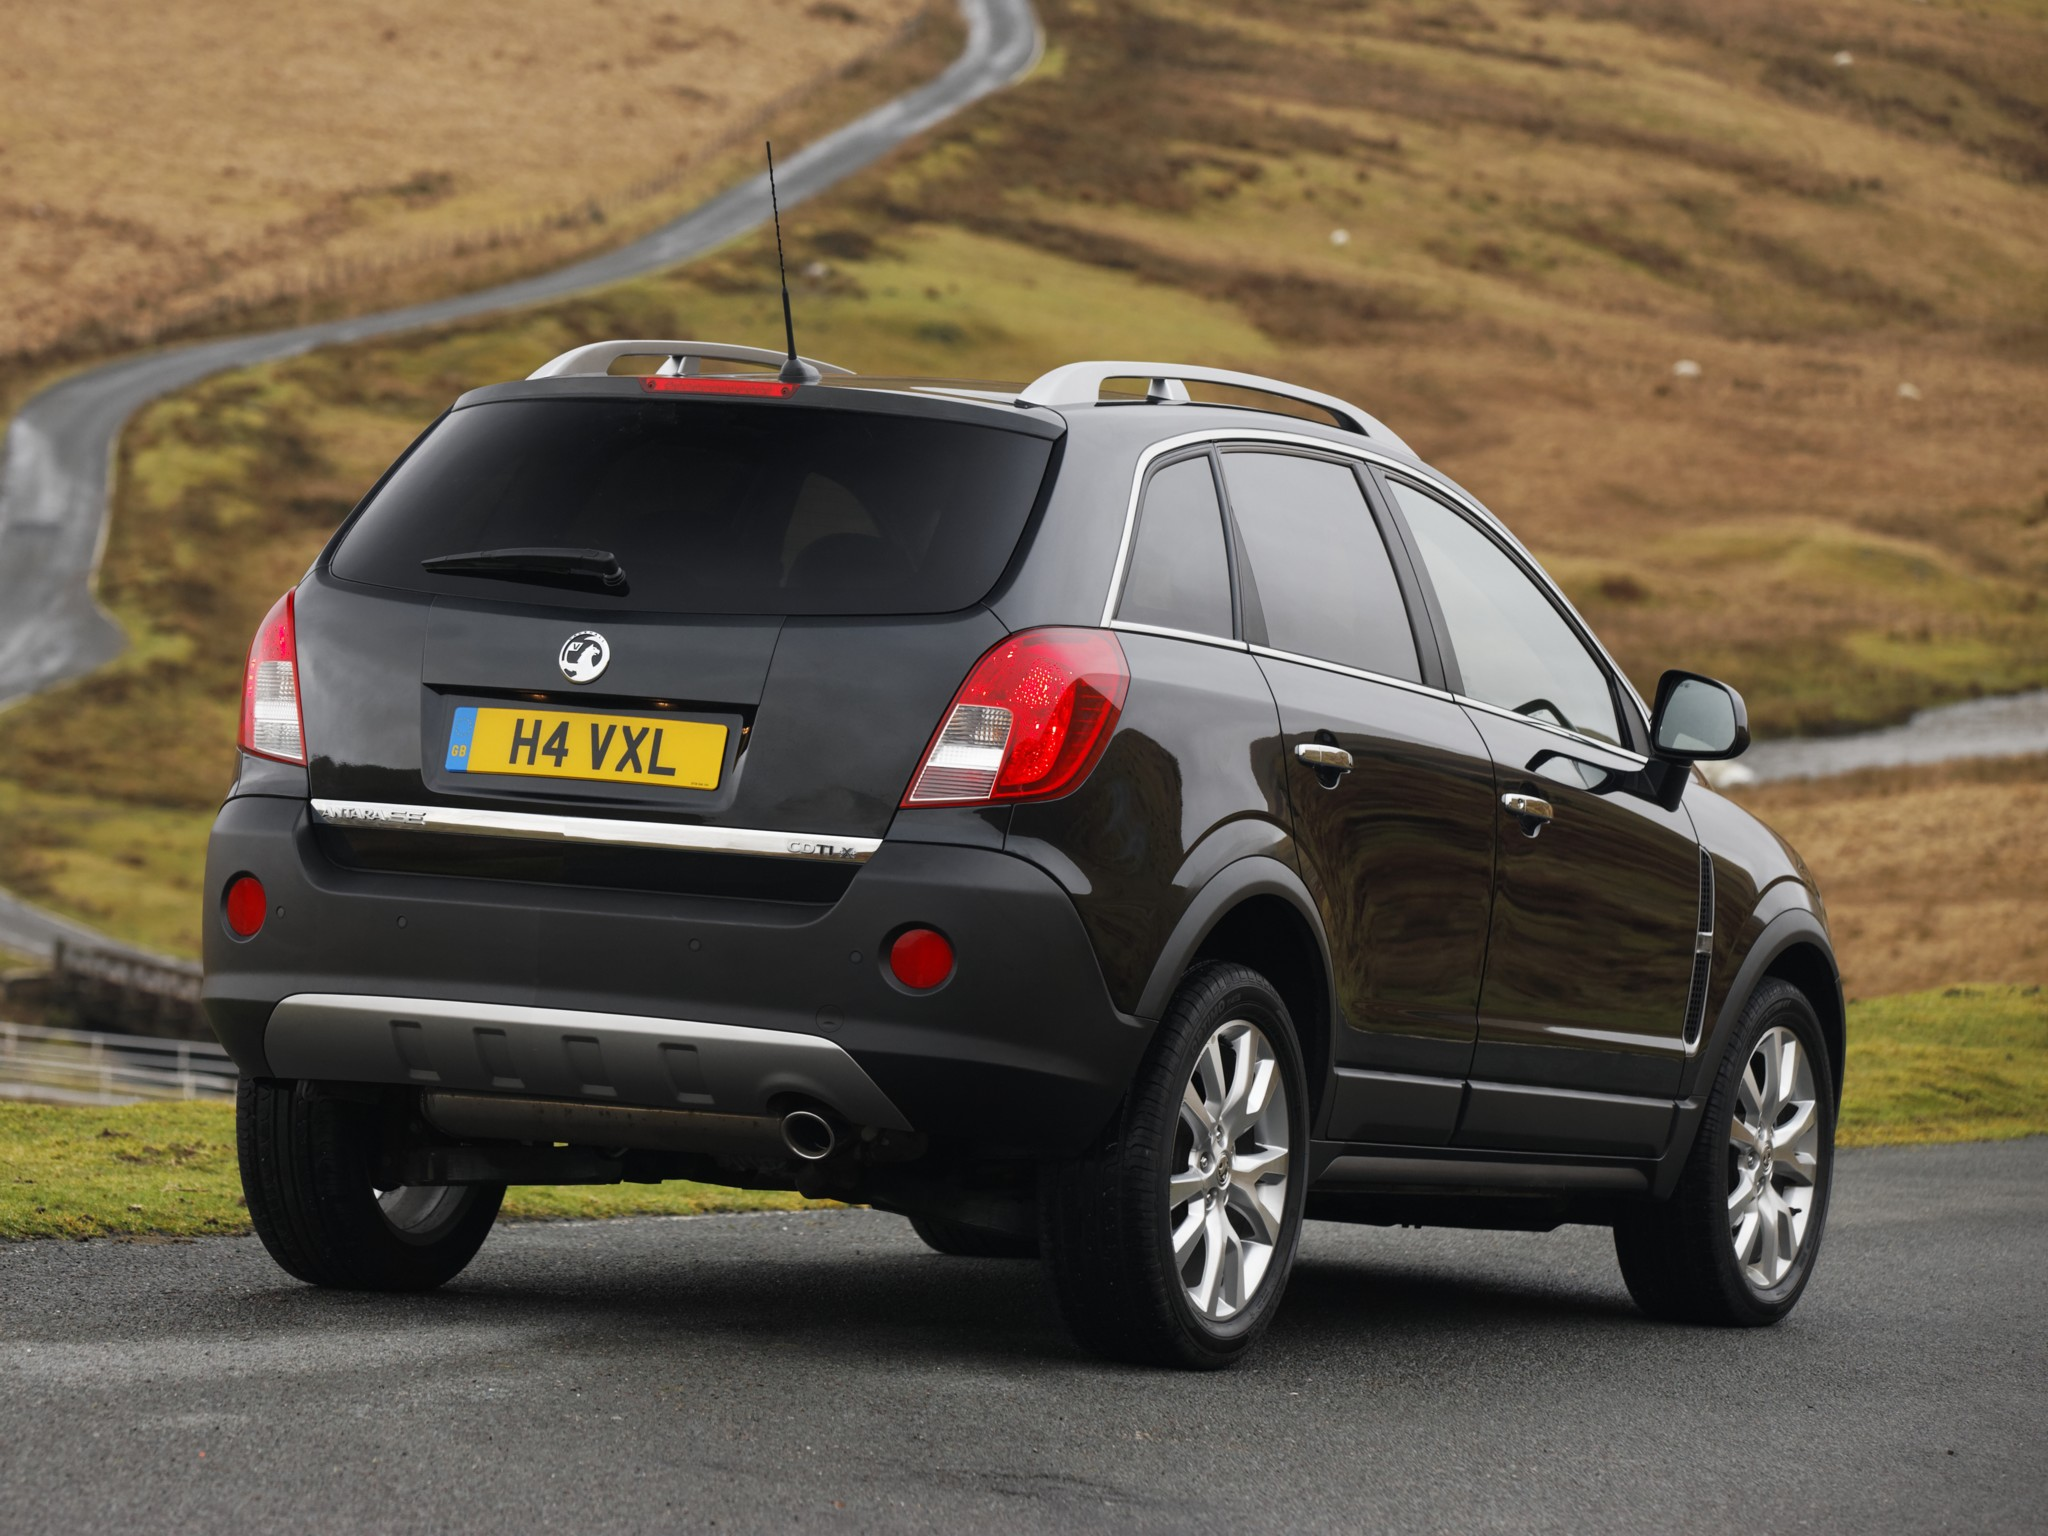 Vauxhall Antara Specs Amp Photos 2010 2011 2012 2013